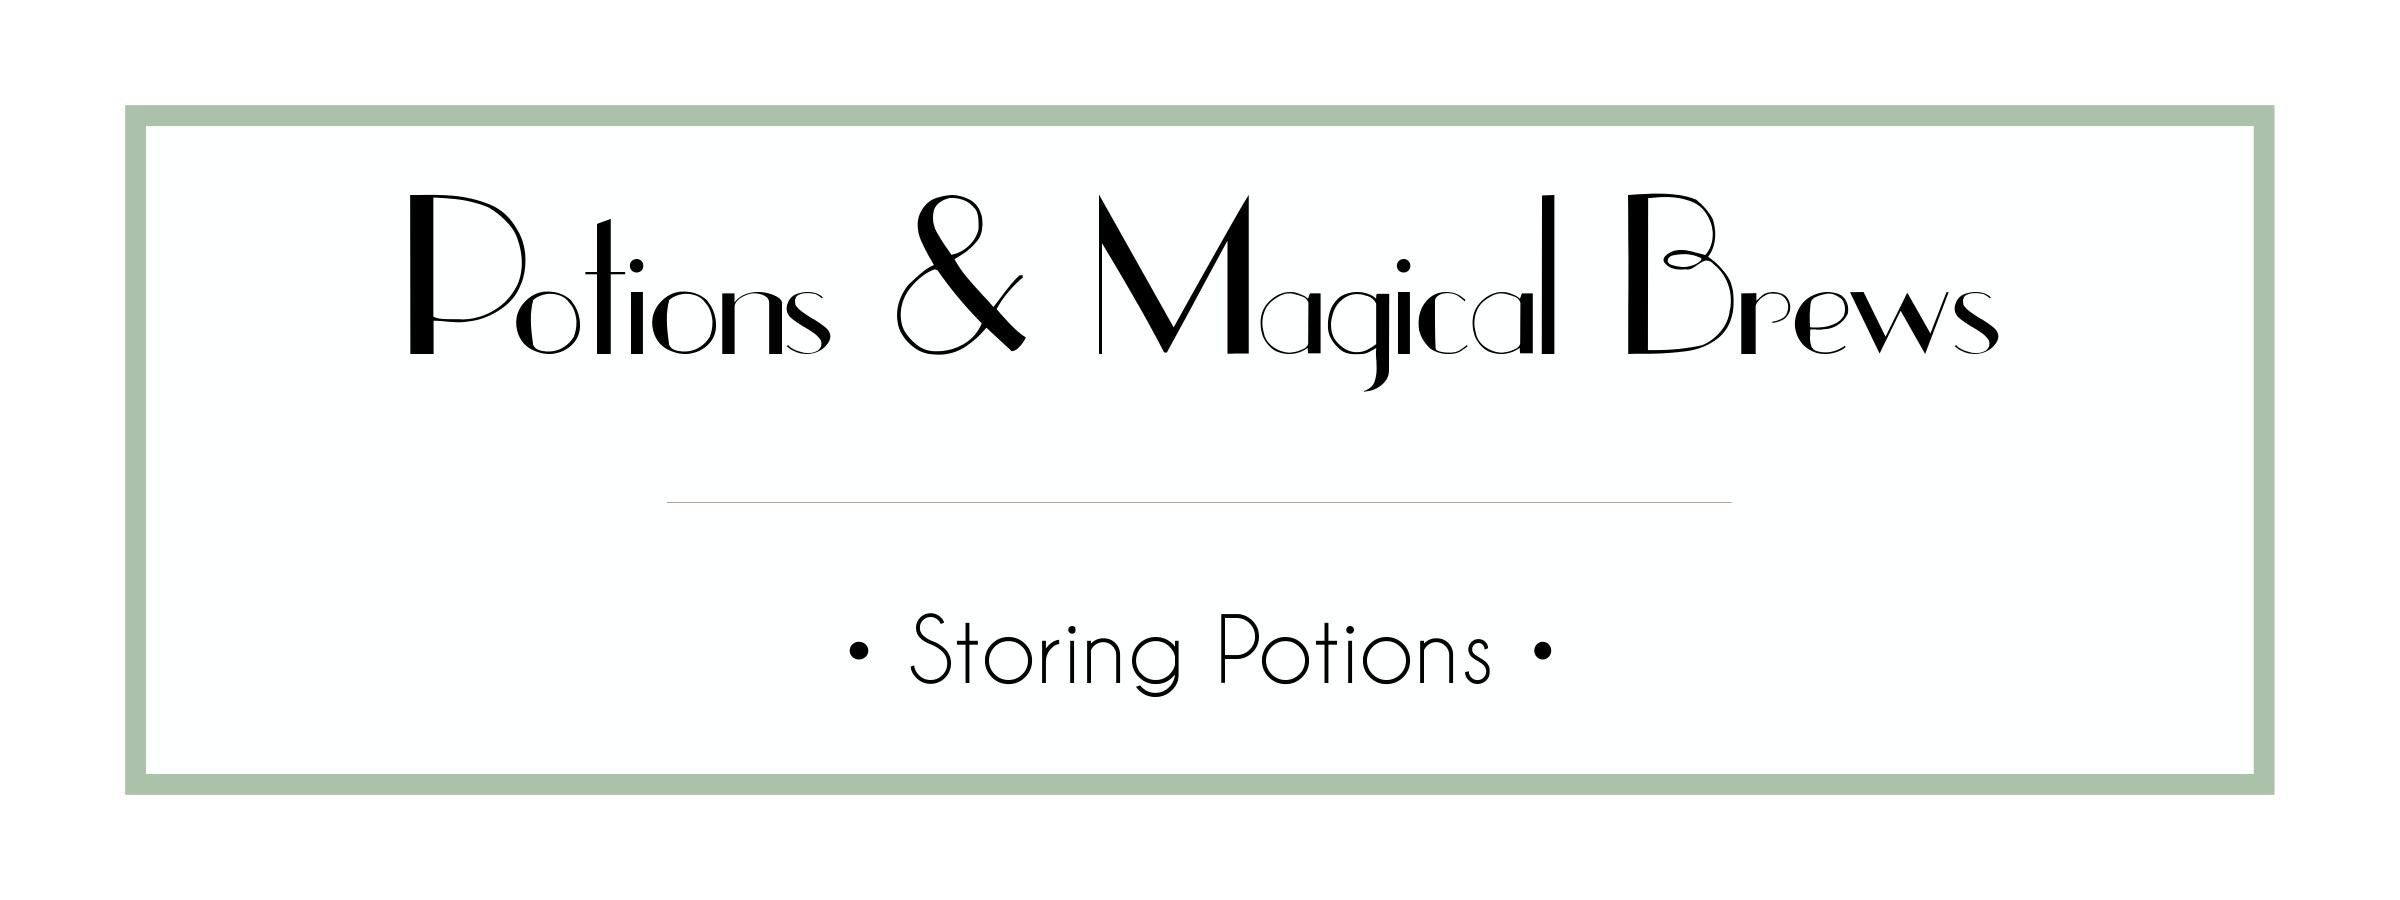 Potions & Magical Brews - Storing Potions